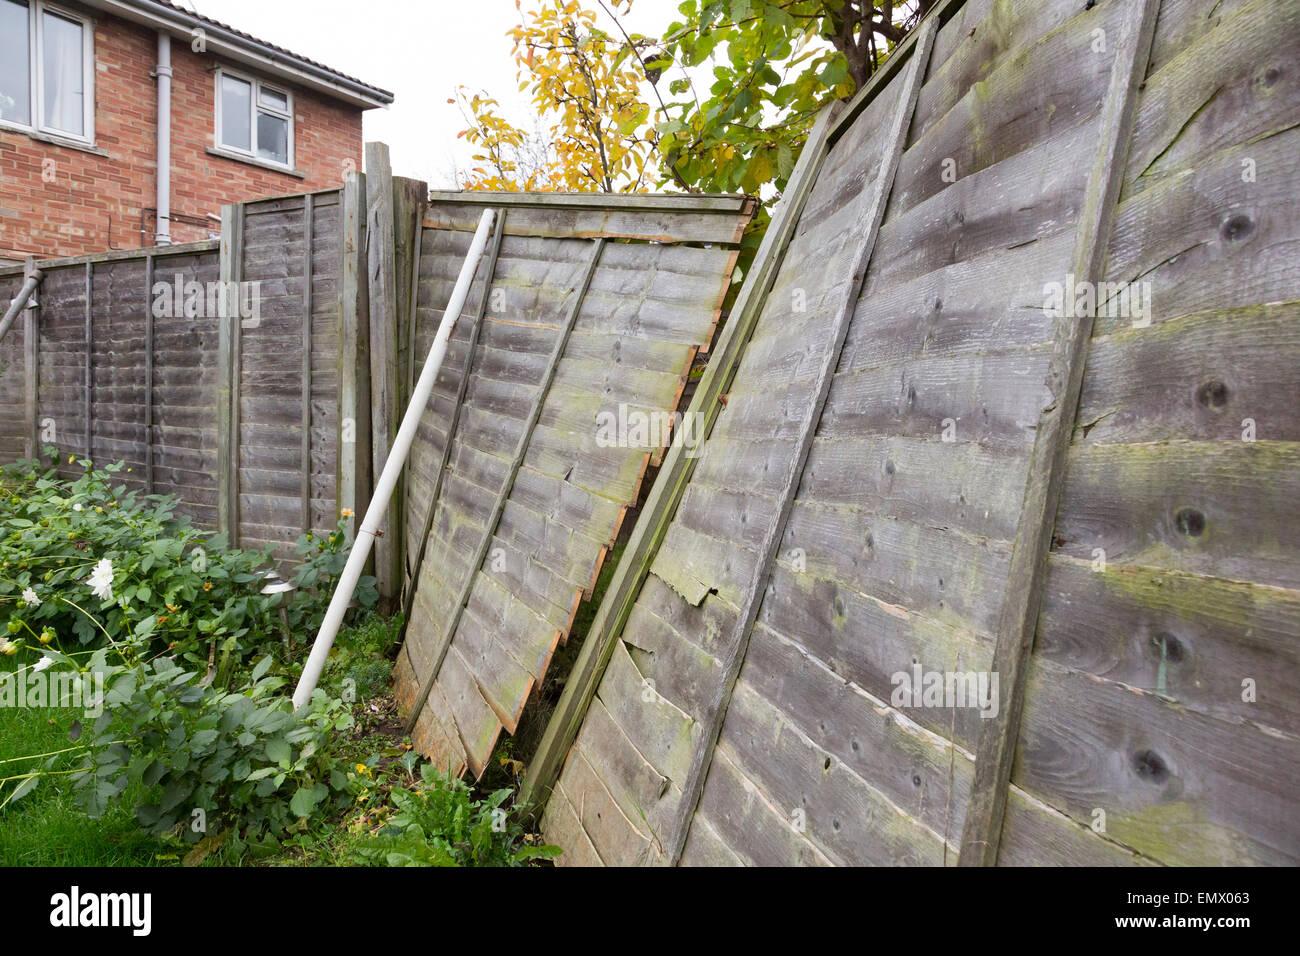 Broken fence panels stock photos broken fence panels stock wooden panel fence blown over in a storm stock image baanklon Images